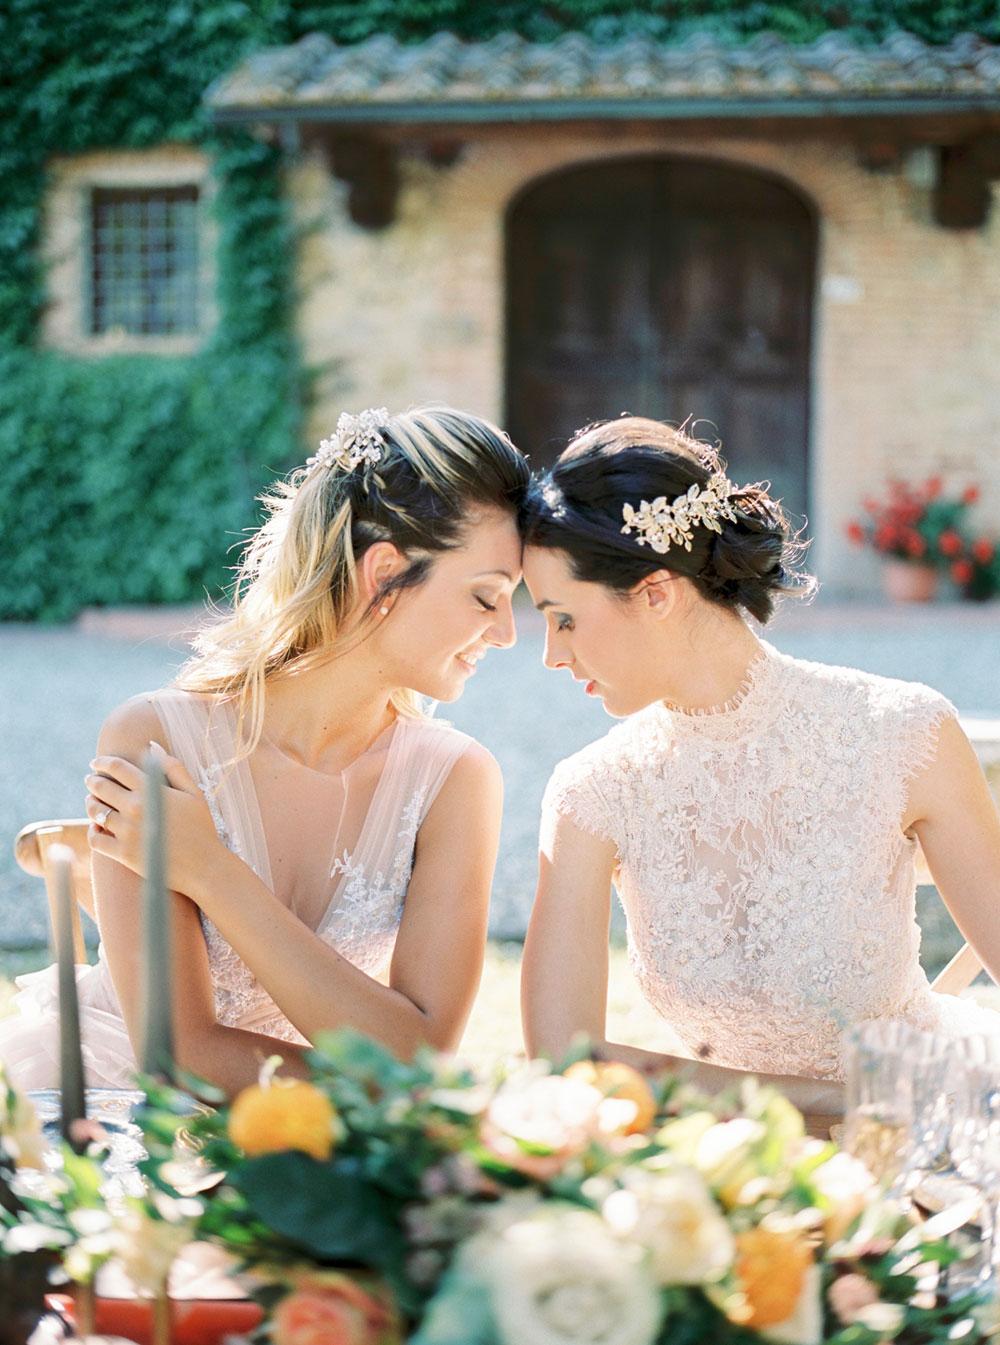 Linari-Tuscany-Elopement-Courtney-Michaela-218